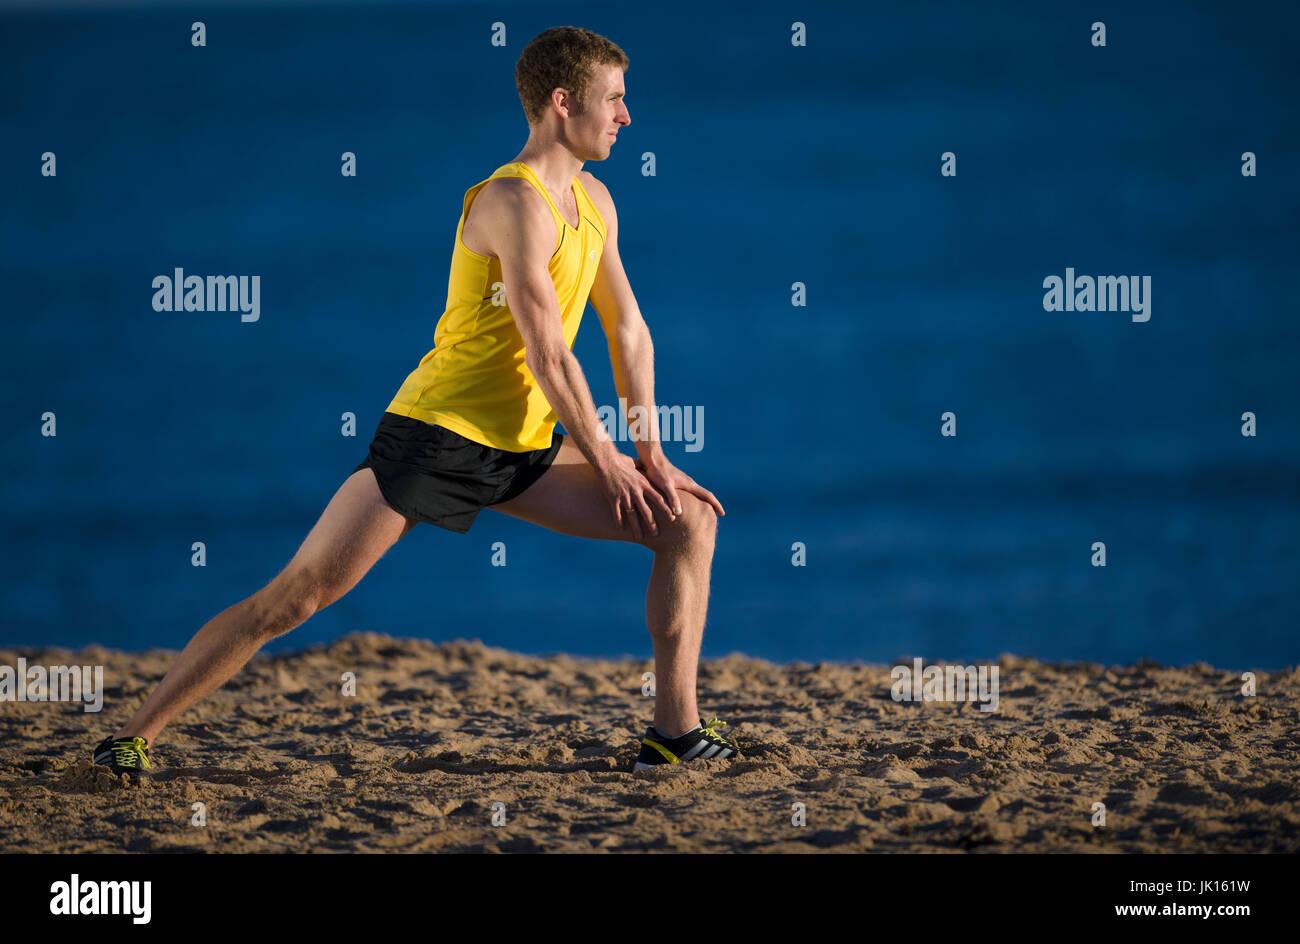 Runner l'échauffement étirements des muscles des jambes Photo Stock